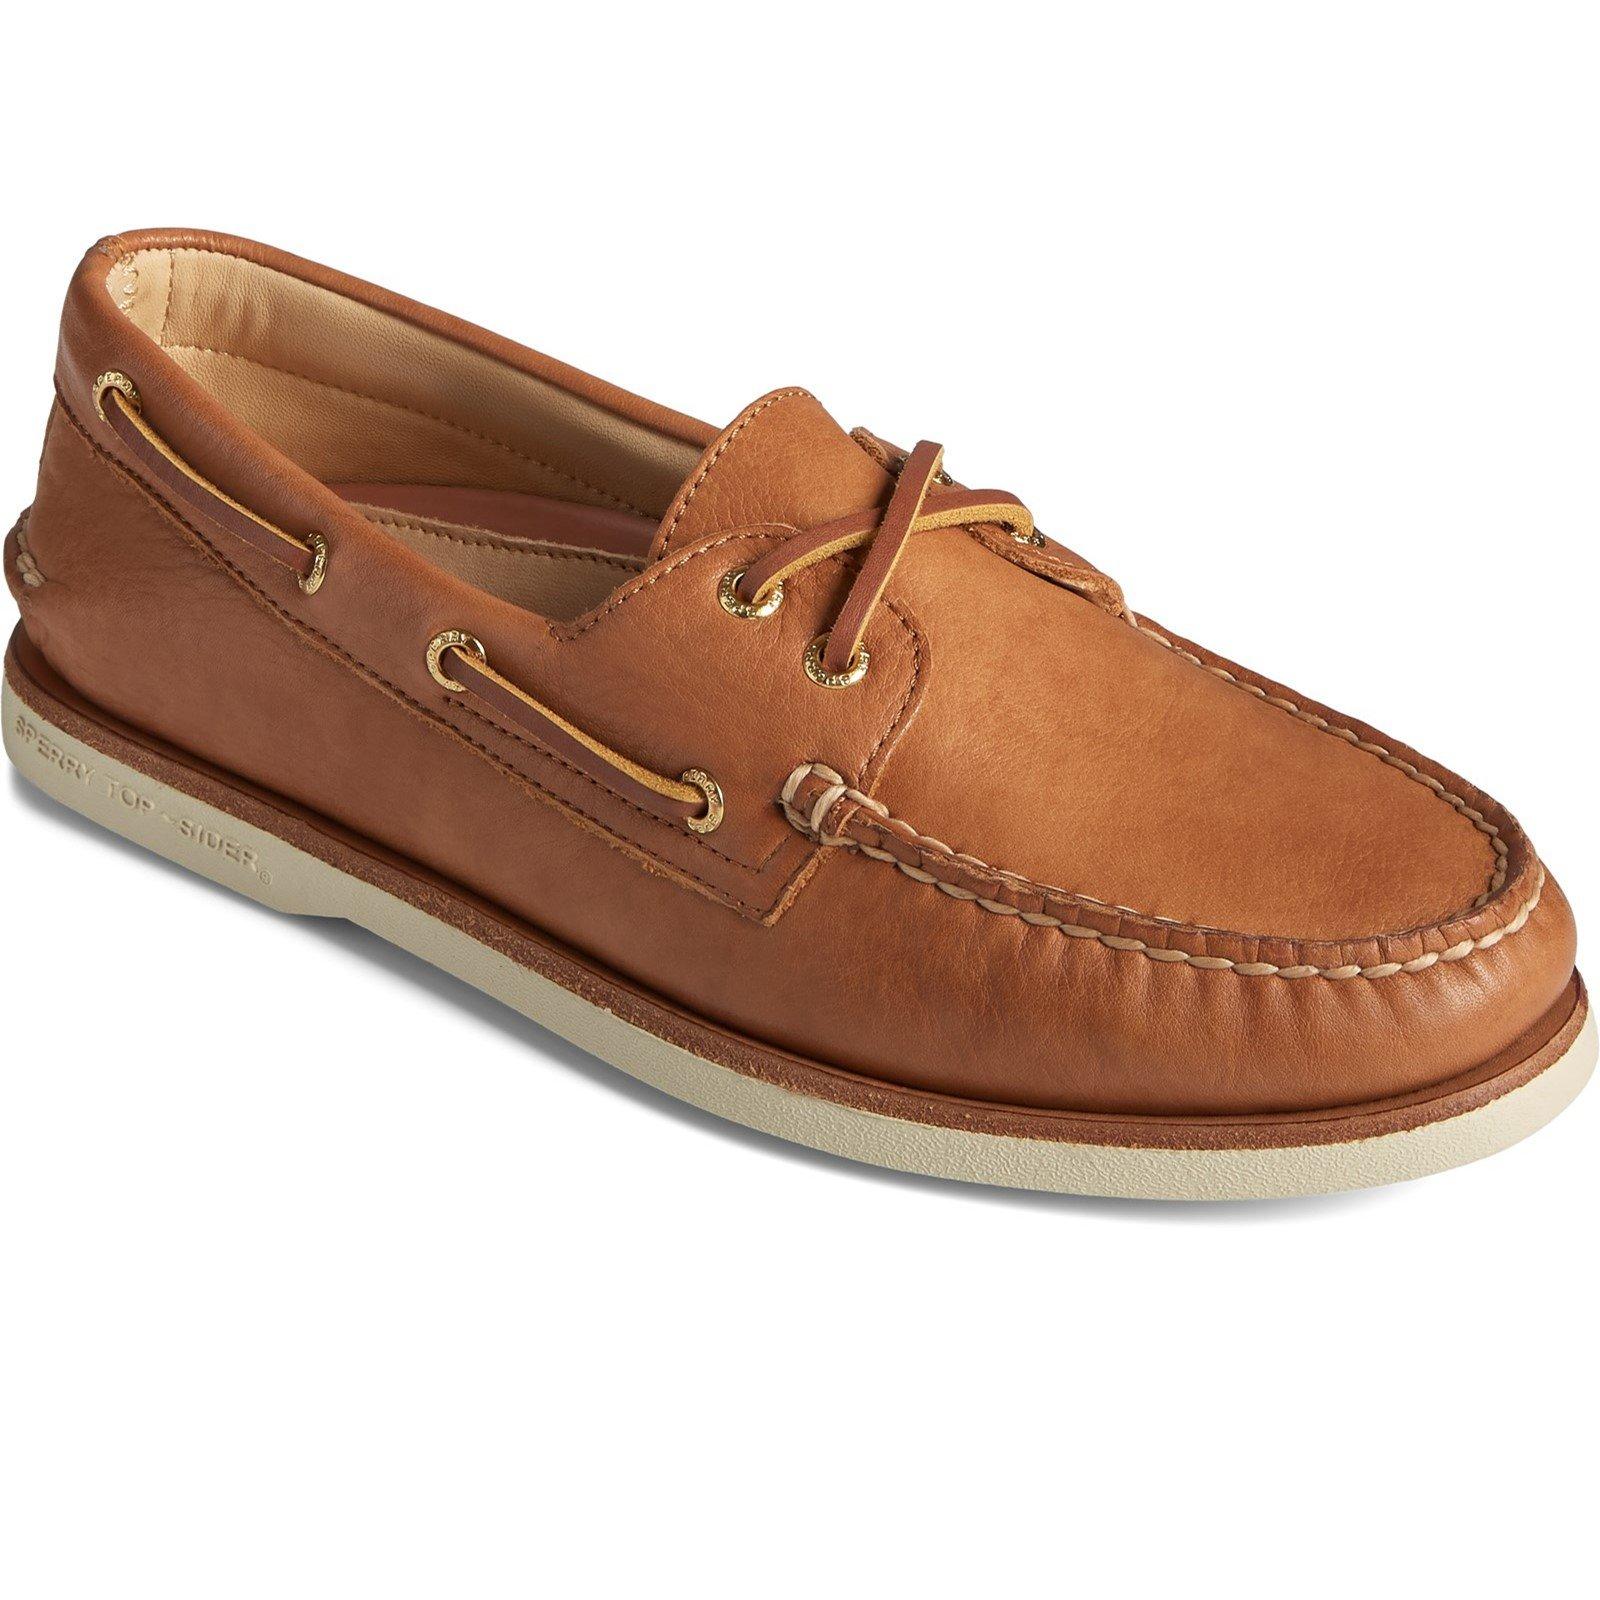 Sperry Men's A/O 2-Eye Boat Shoe Various Colours 32926 - Tan 10